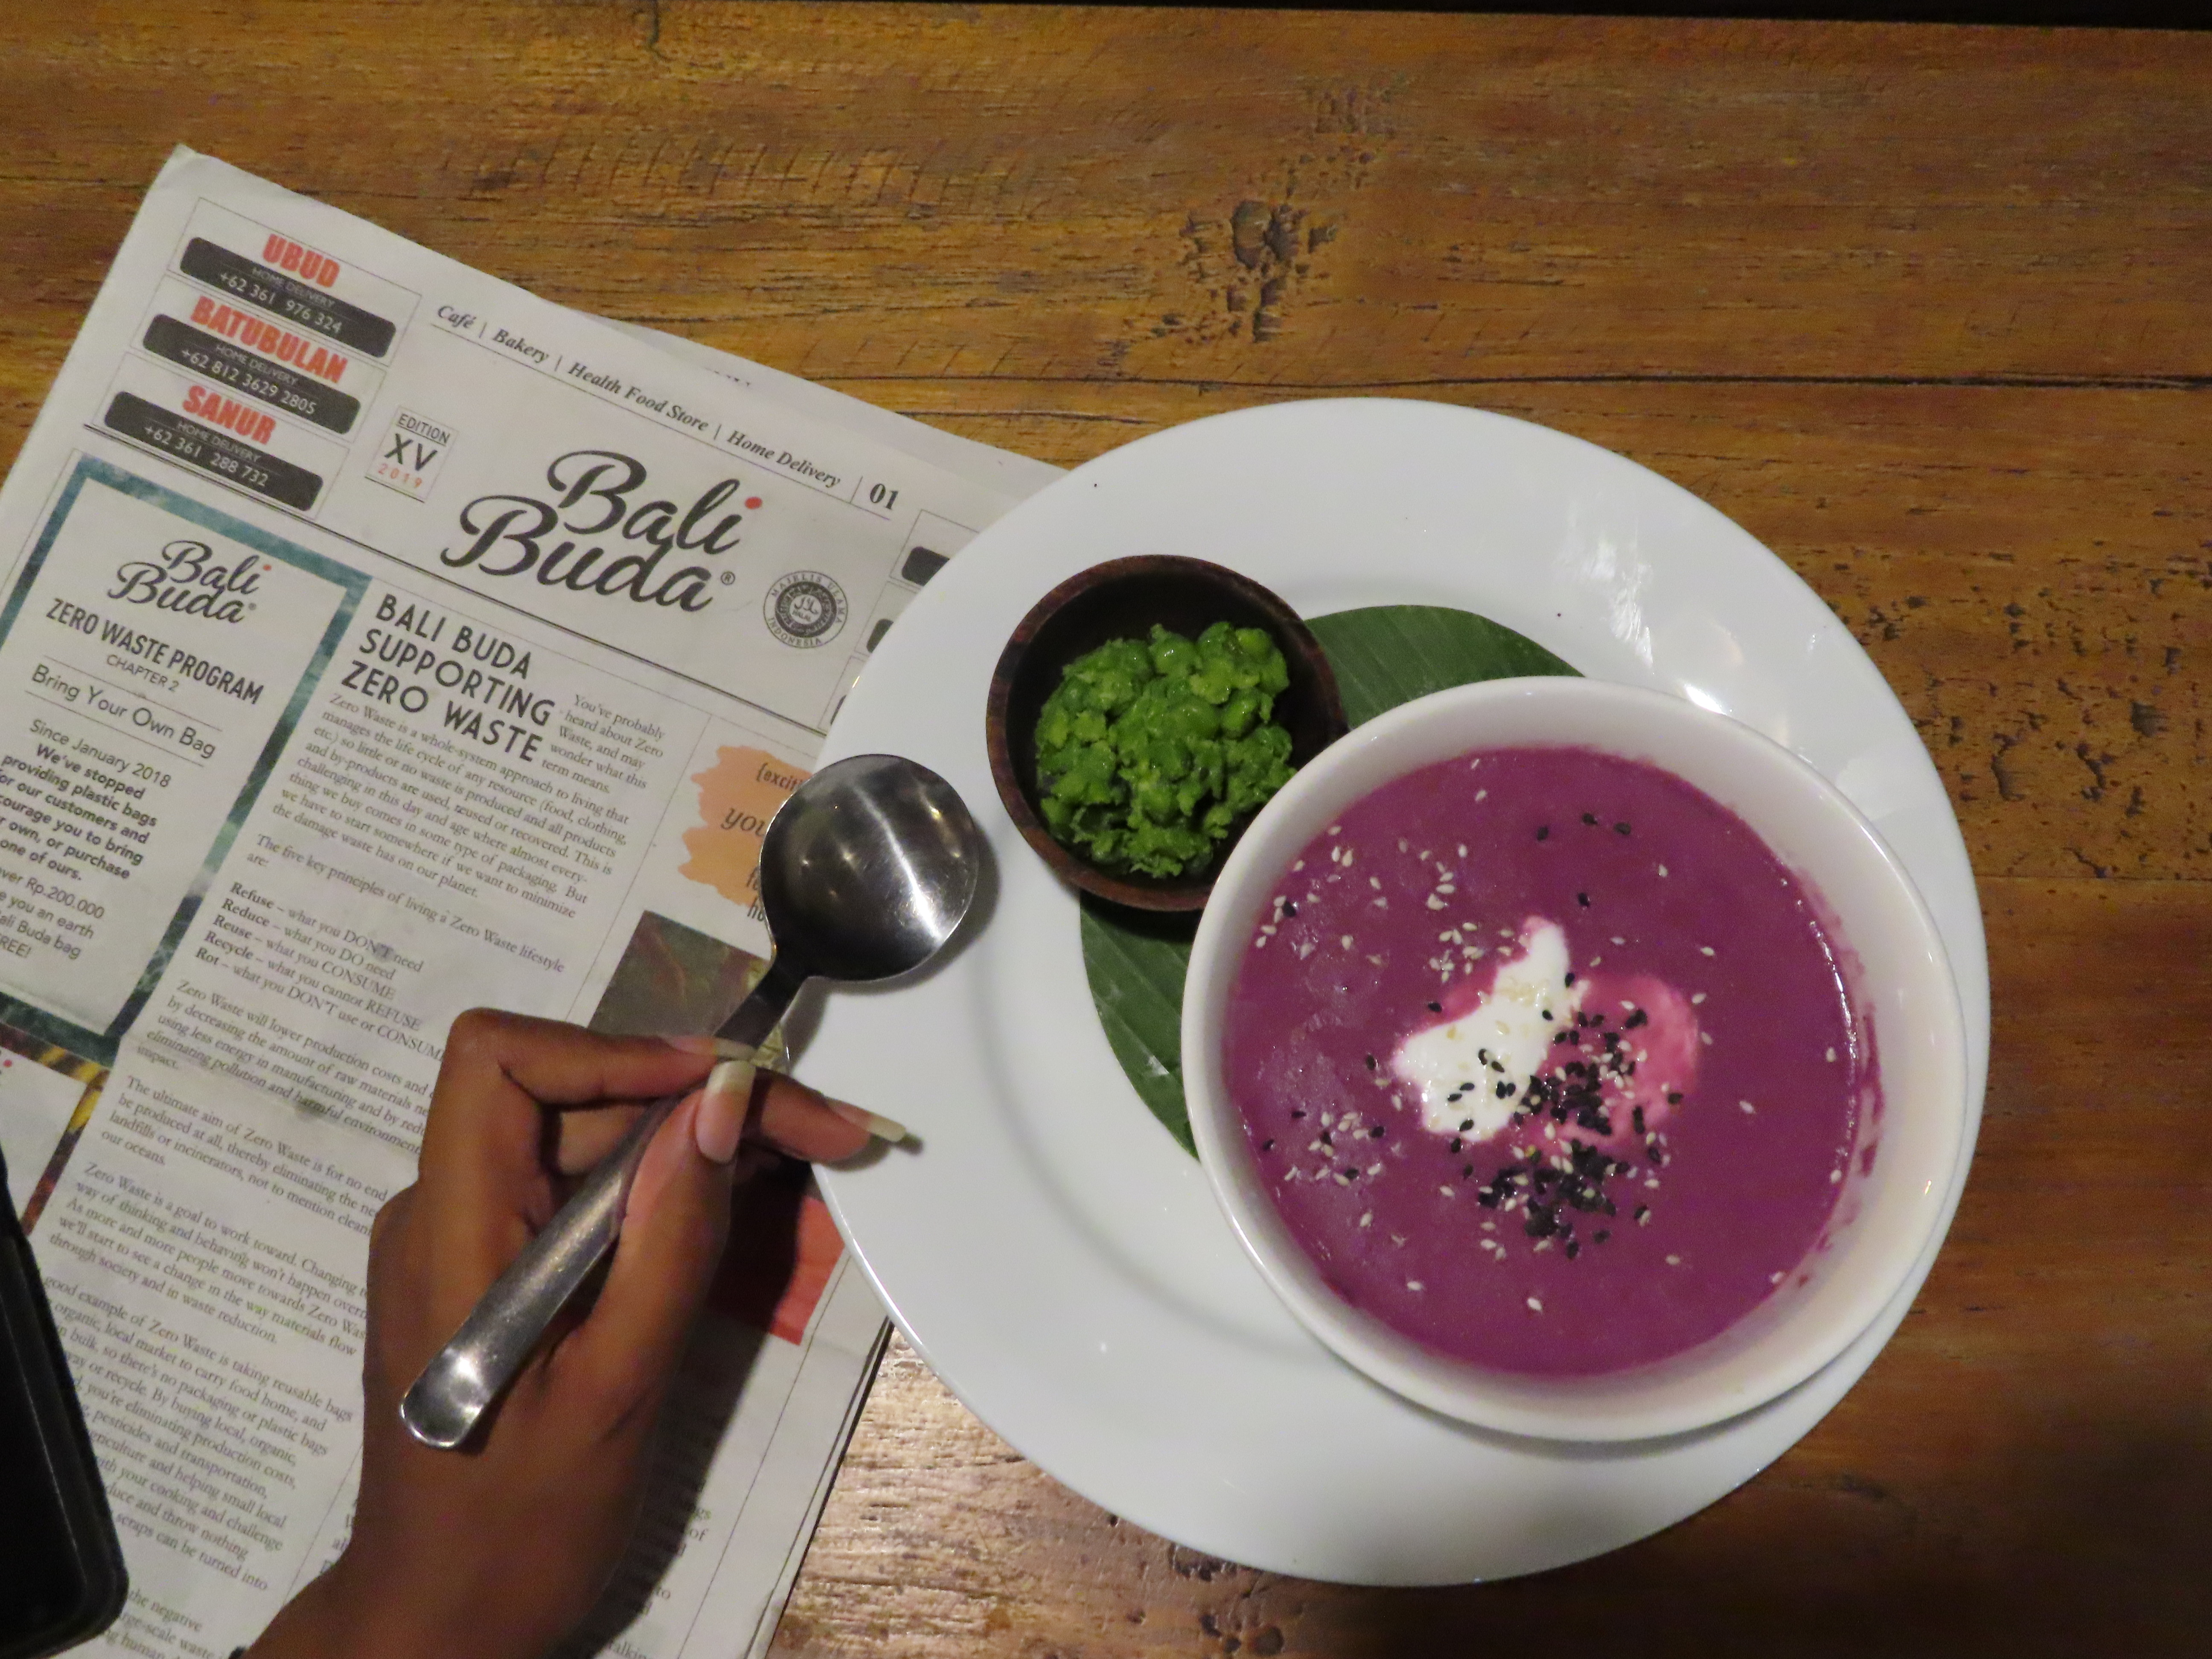 purple sweet potato soup with mashes peas at bali buda in canguu